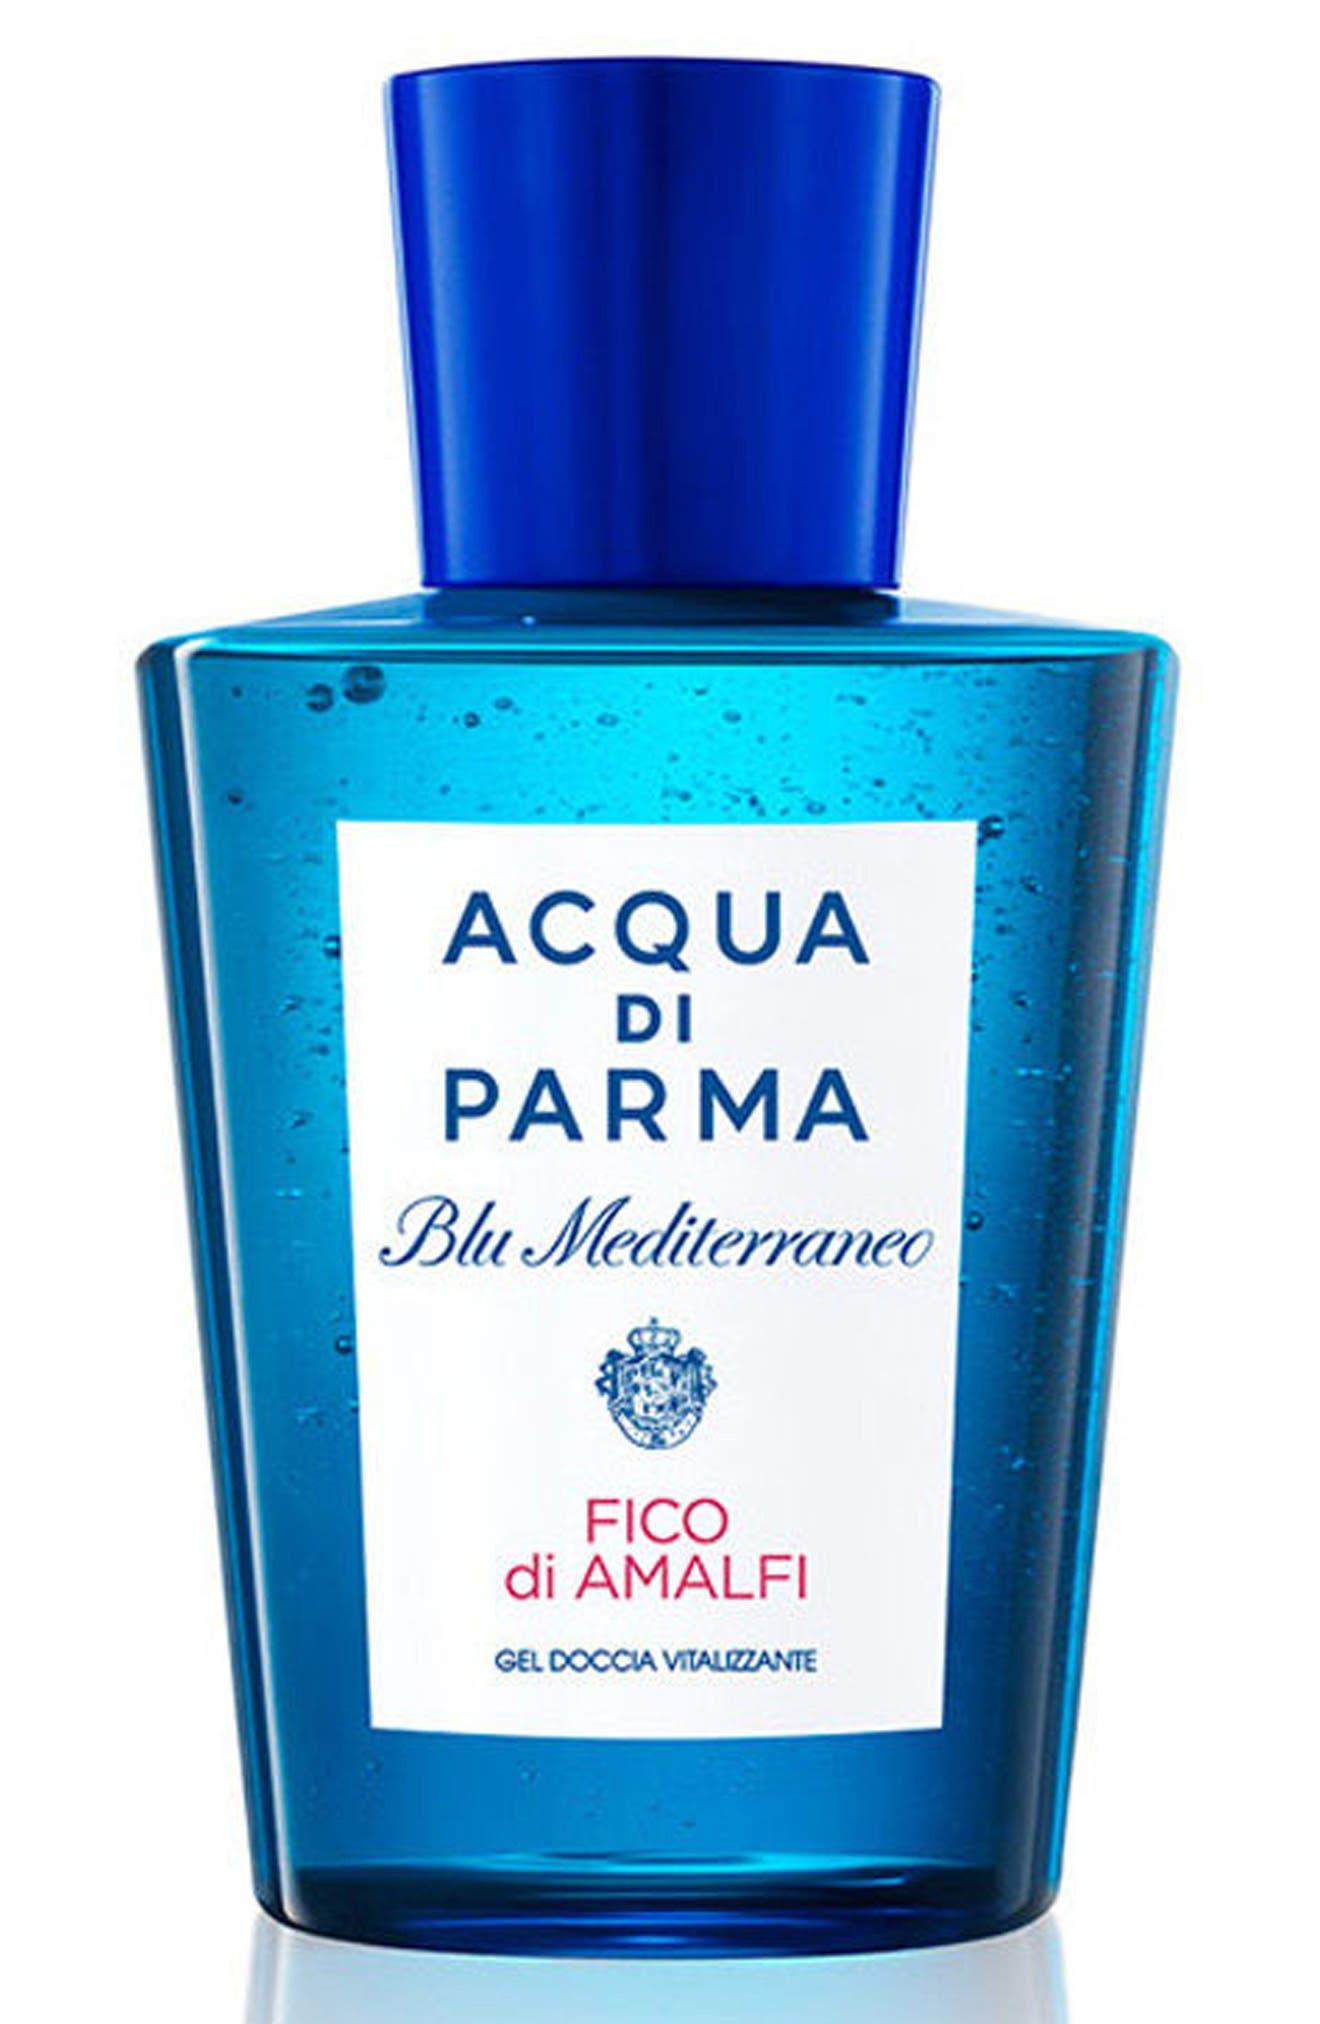 Alternate Image 1 Selected - Acqua di Parma 'Blu Mediterraneo - Fico di Amalfi' Shower Gel